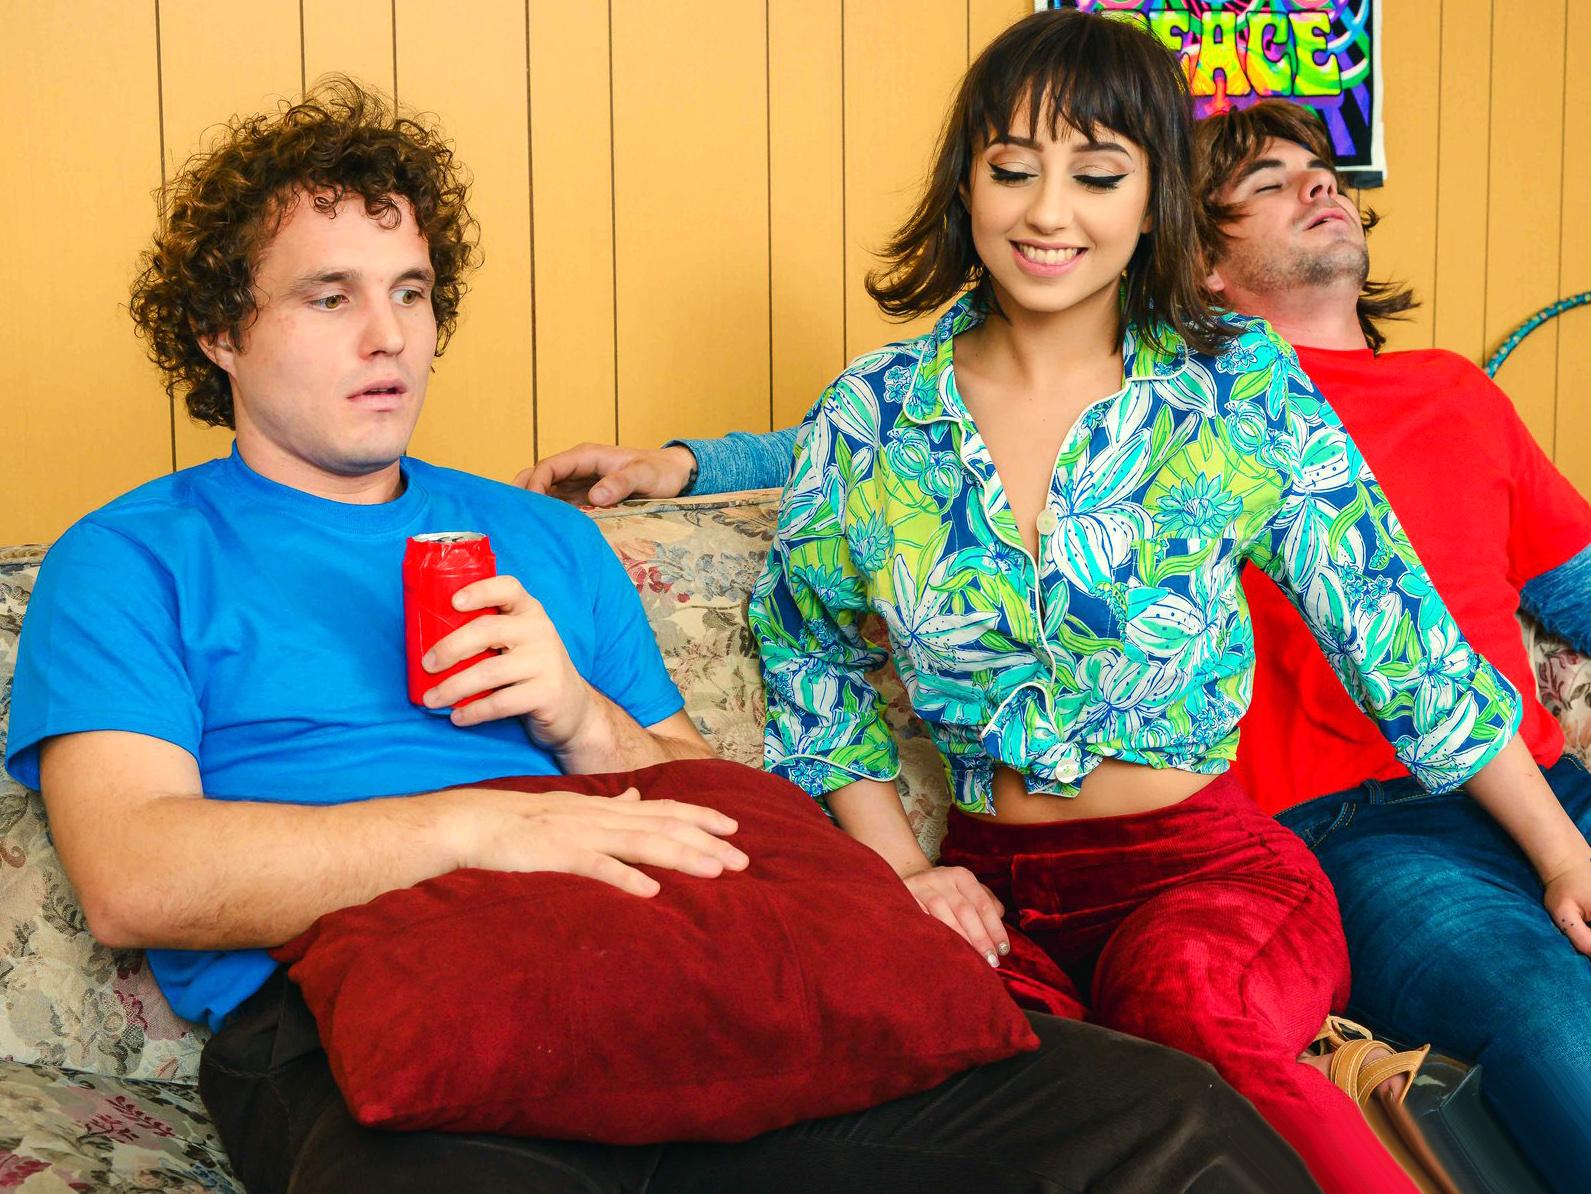 That 70s porn parody free video hot porno